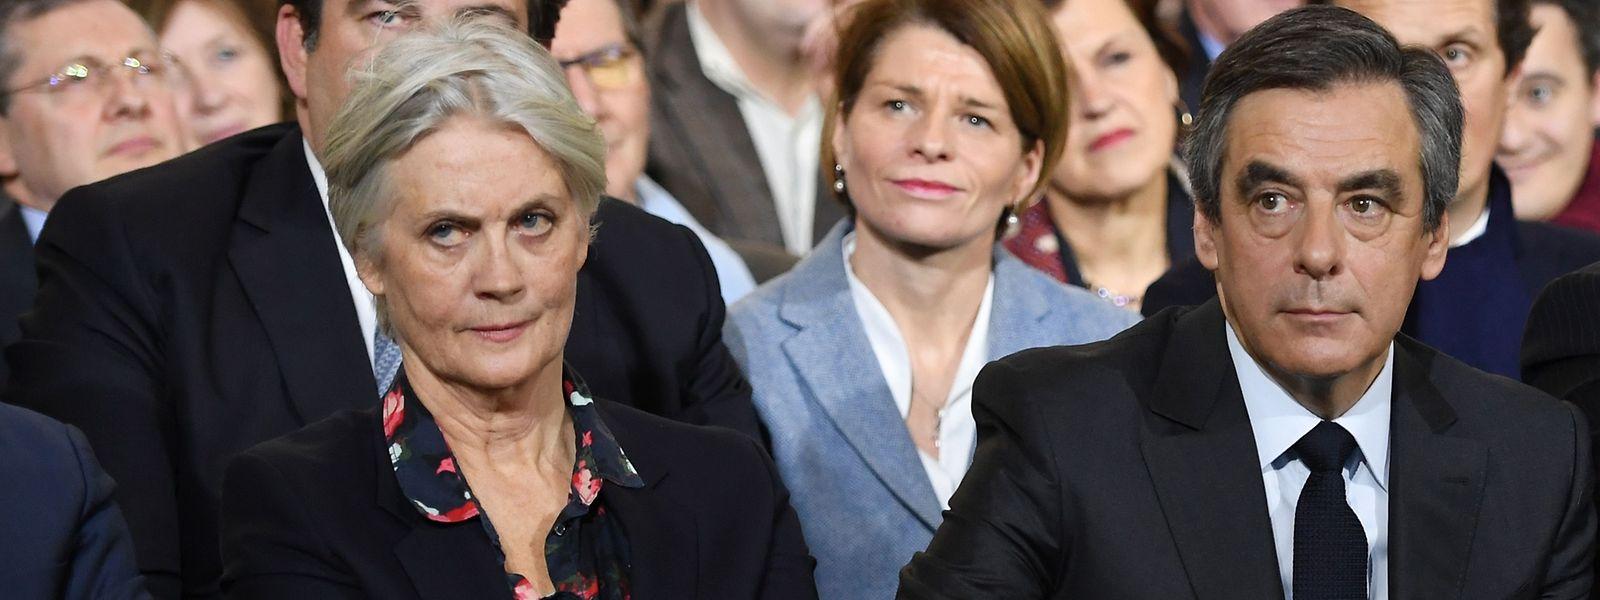 Francois Fillon (R) und seine Frau Penelope.